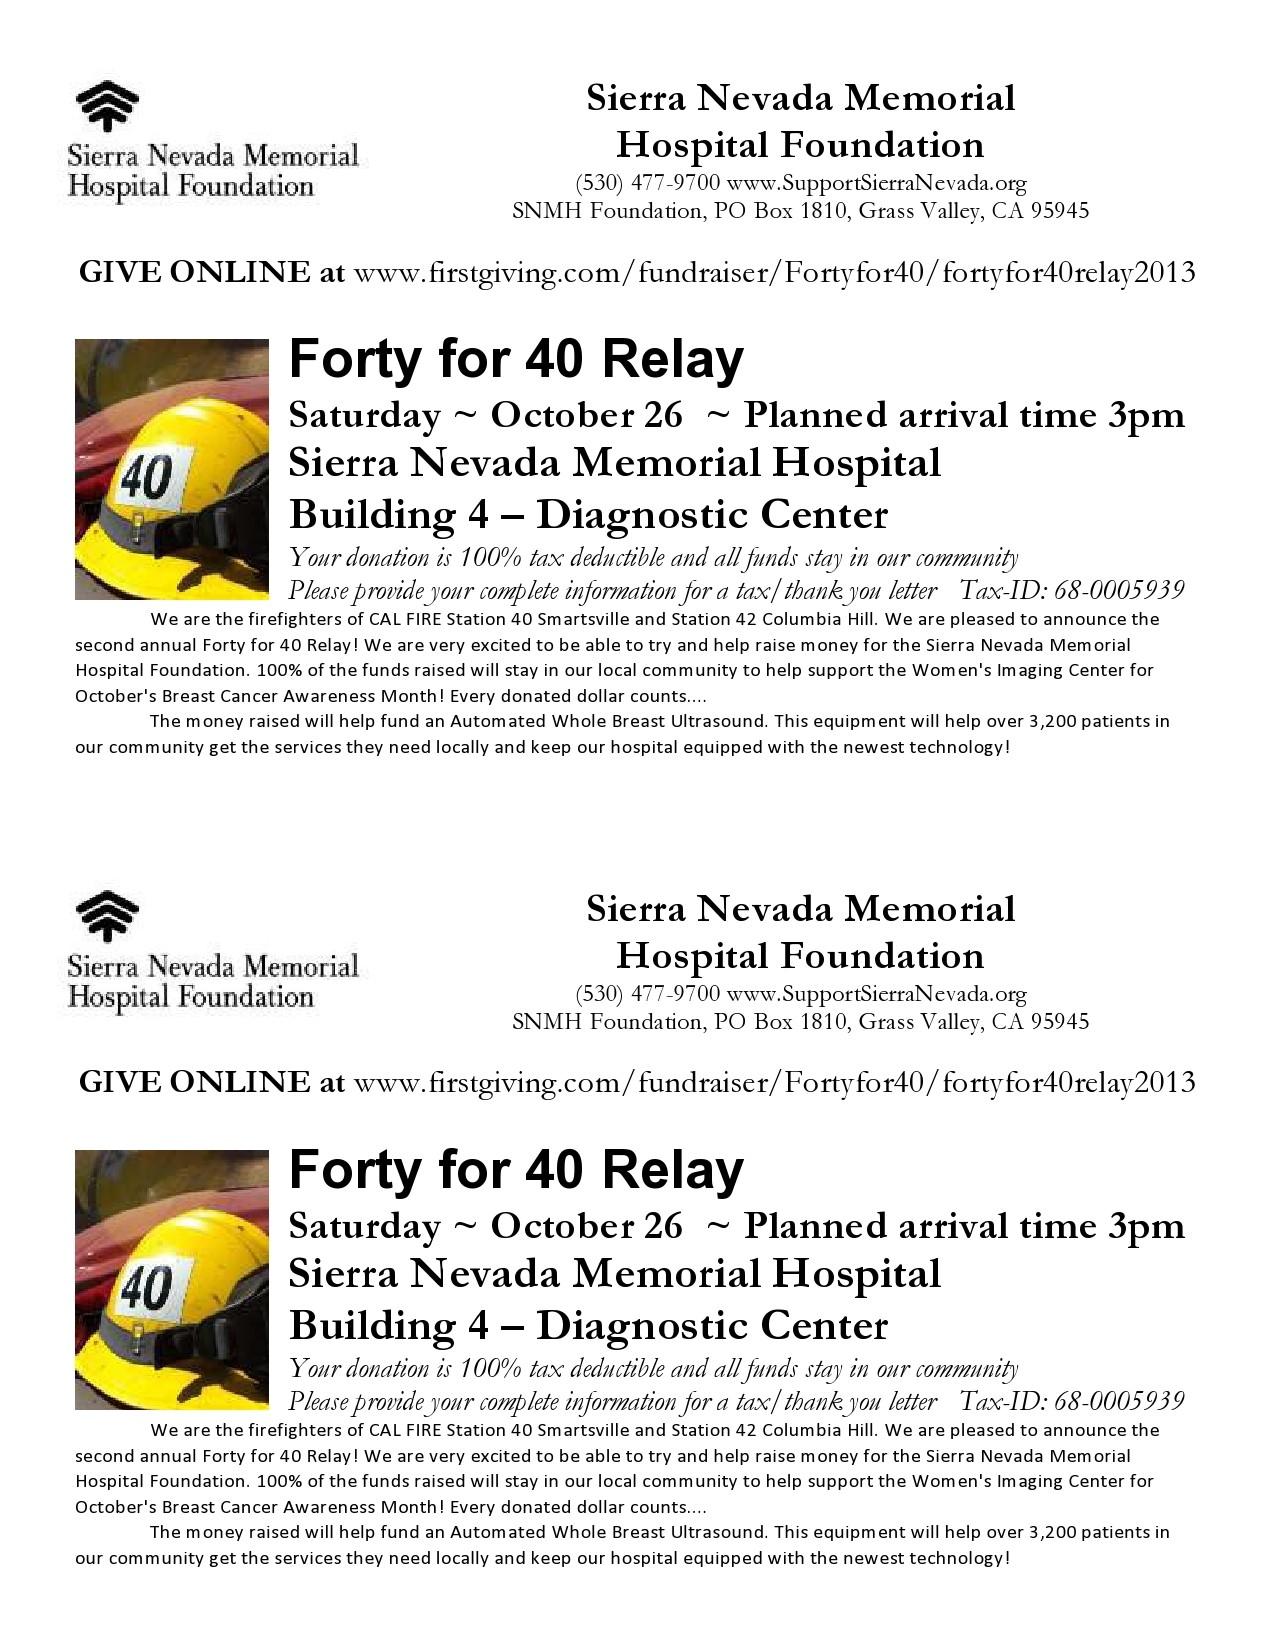 Free fundraiser flyer 34